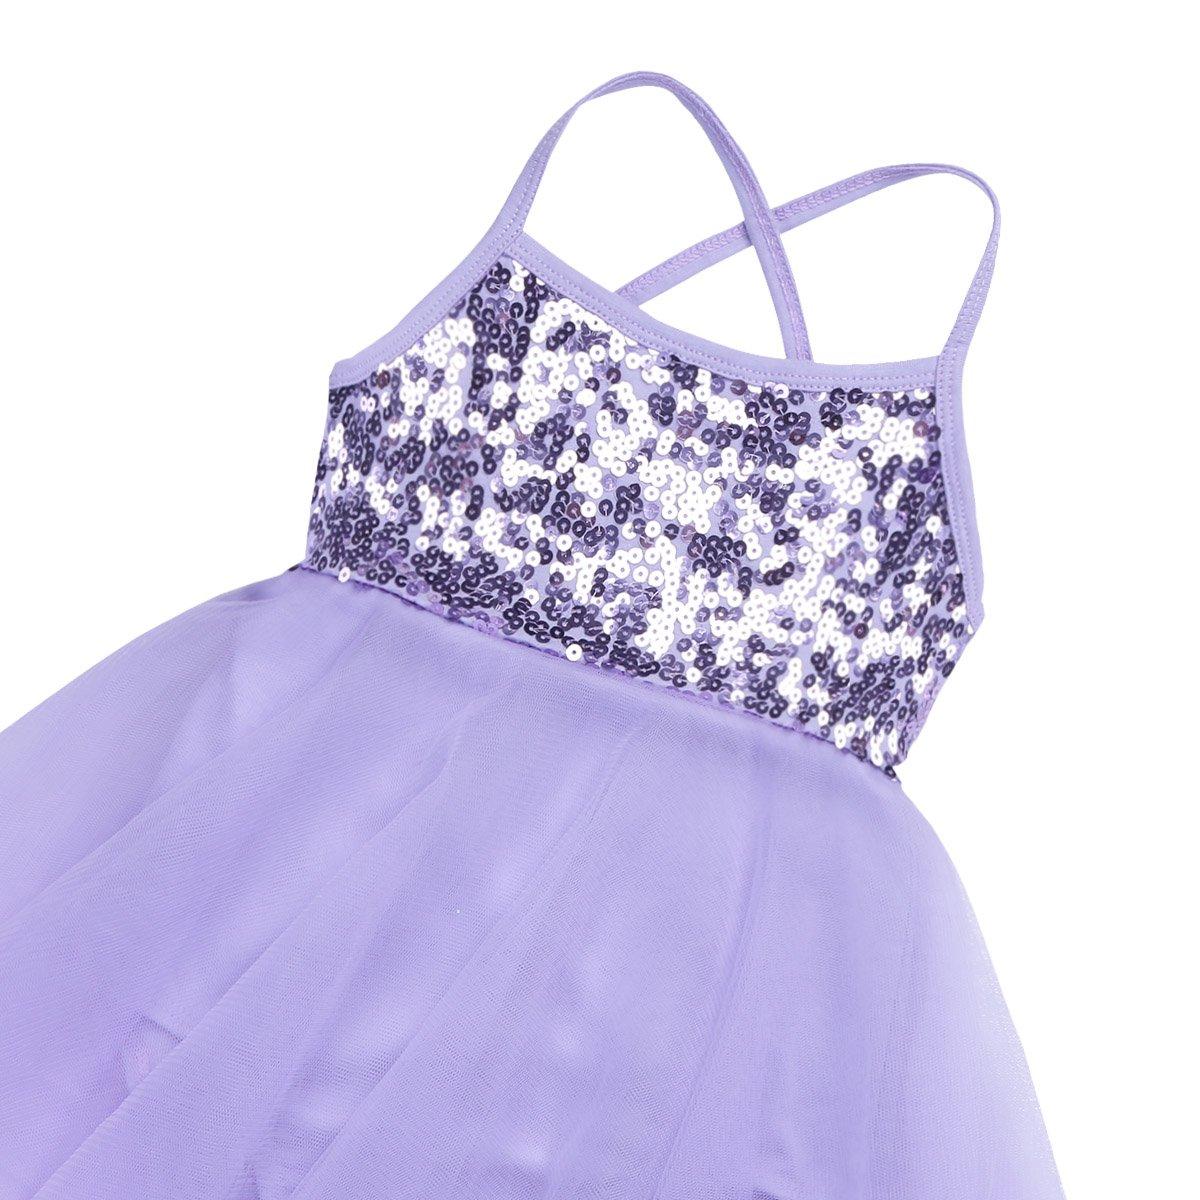 d92f31f93bb2 CHICTRY Girls Children Shiny Sparkle Ballet Skirted Dance Leotard ...